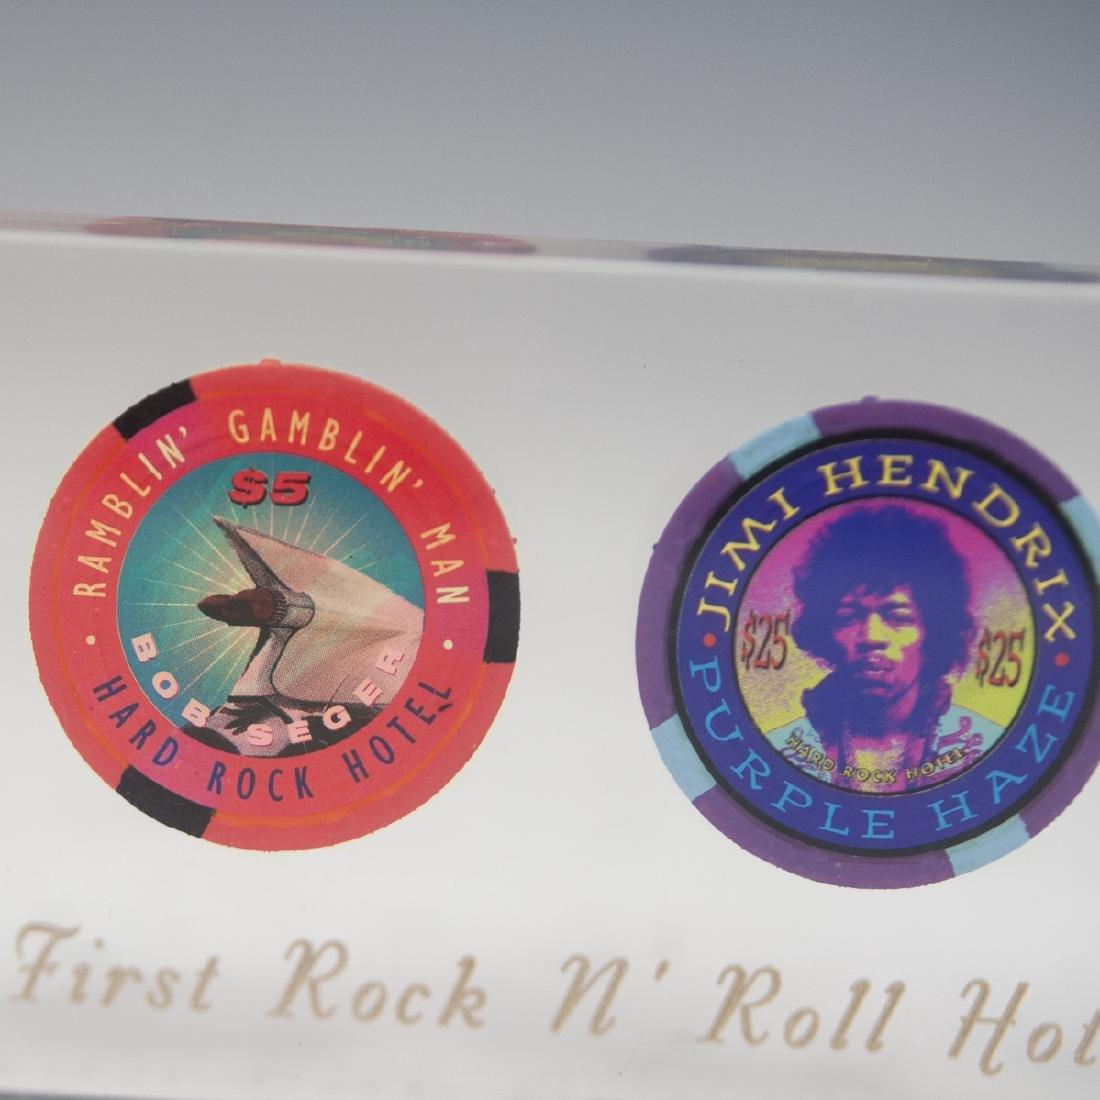 Hard Rock Hotel Casino Chip Set - 3